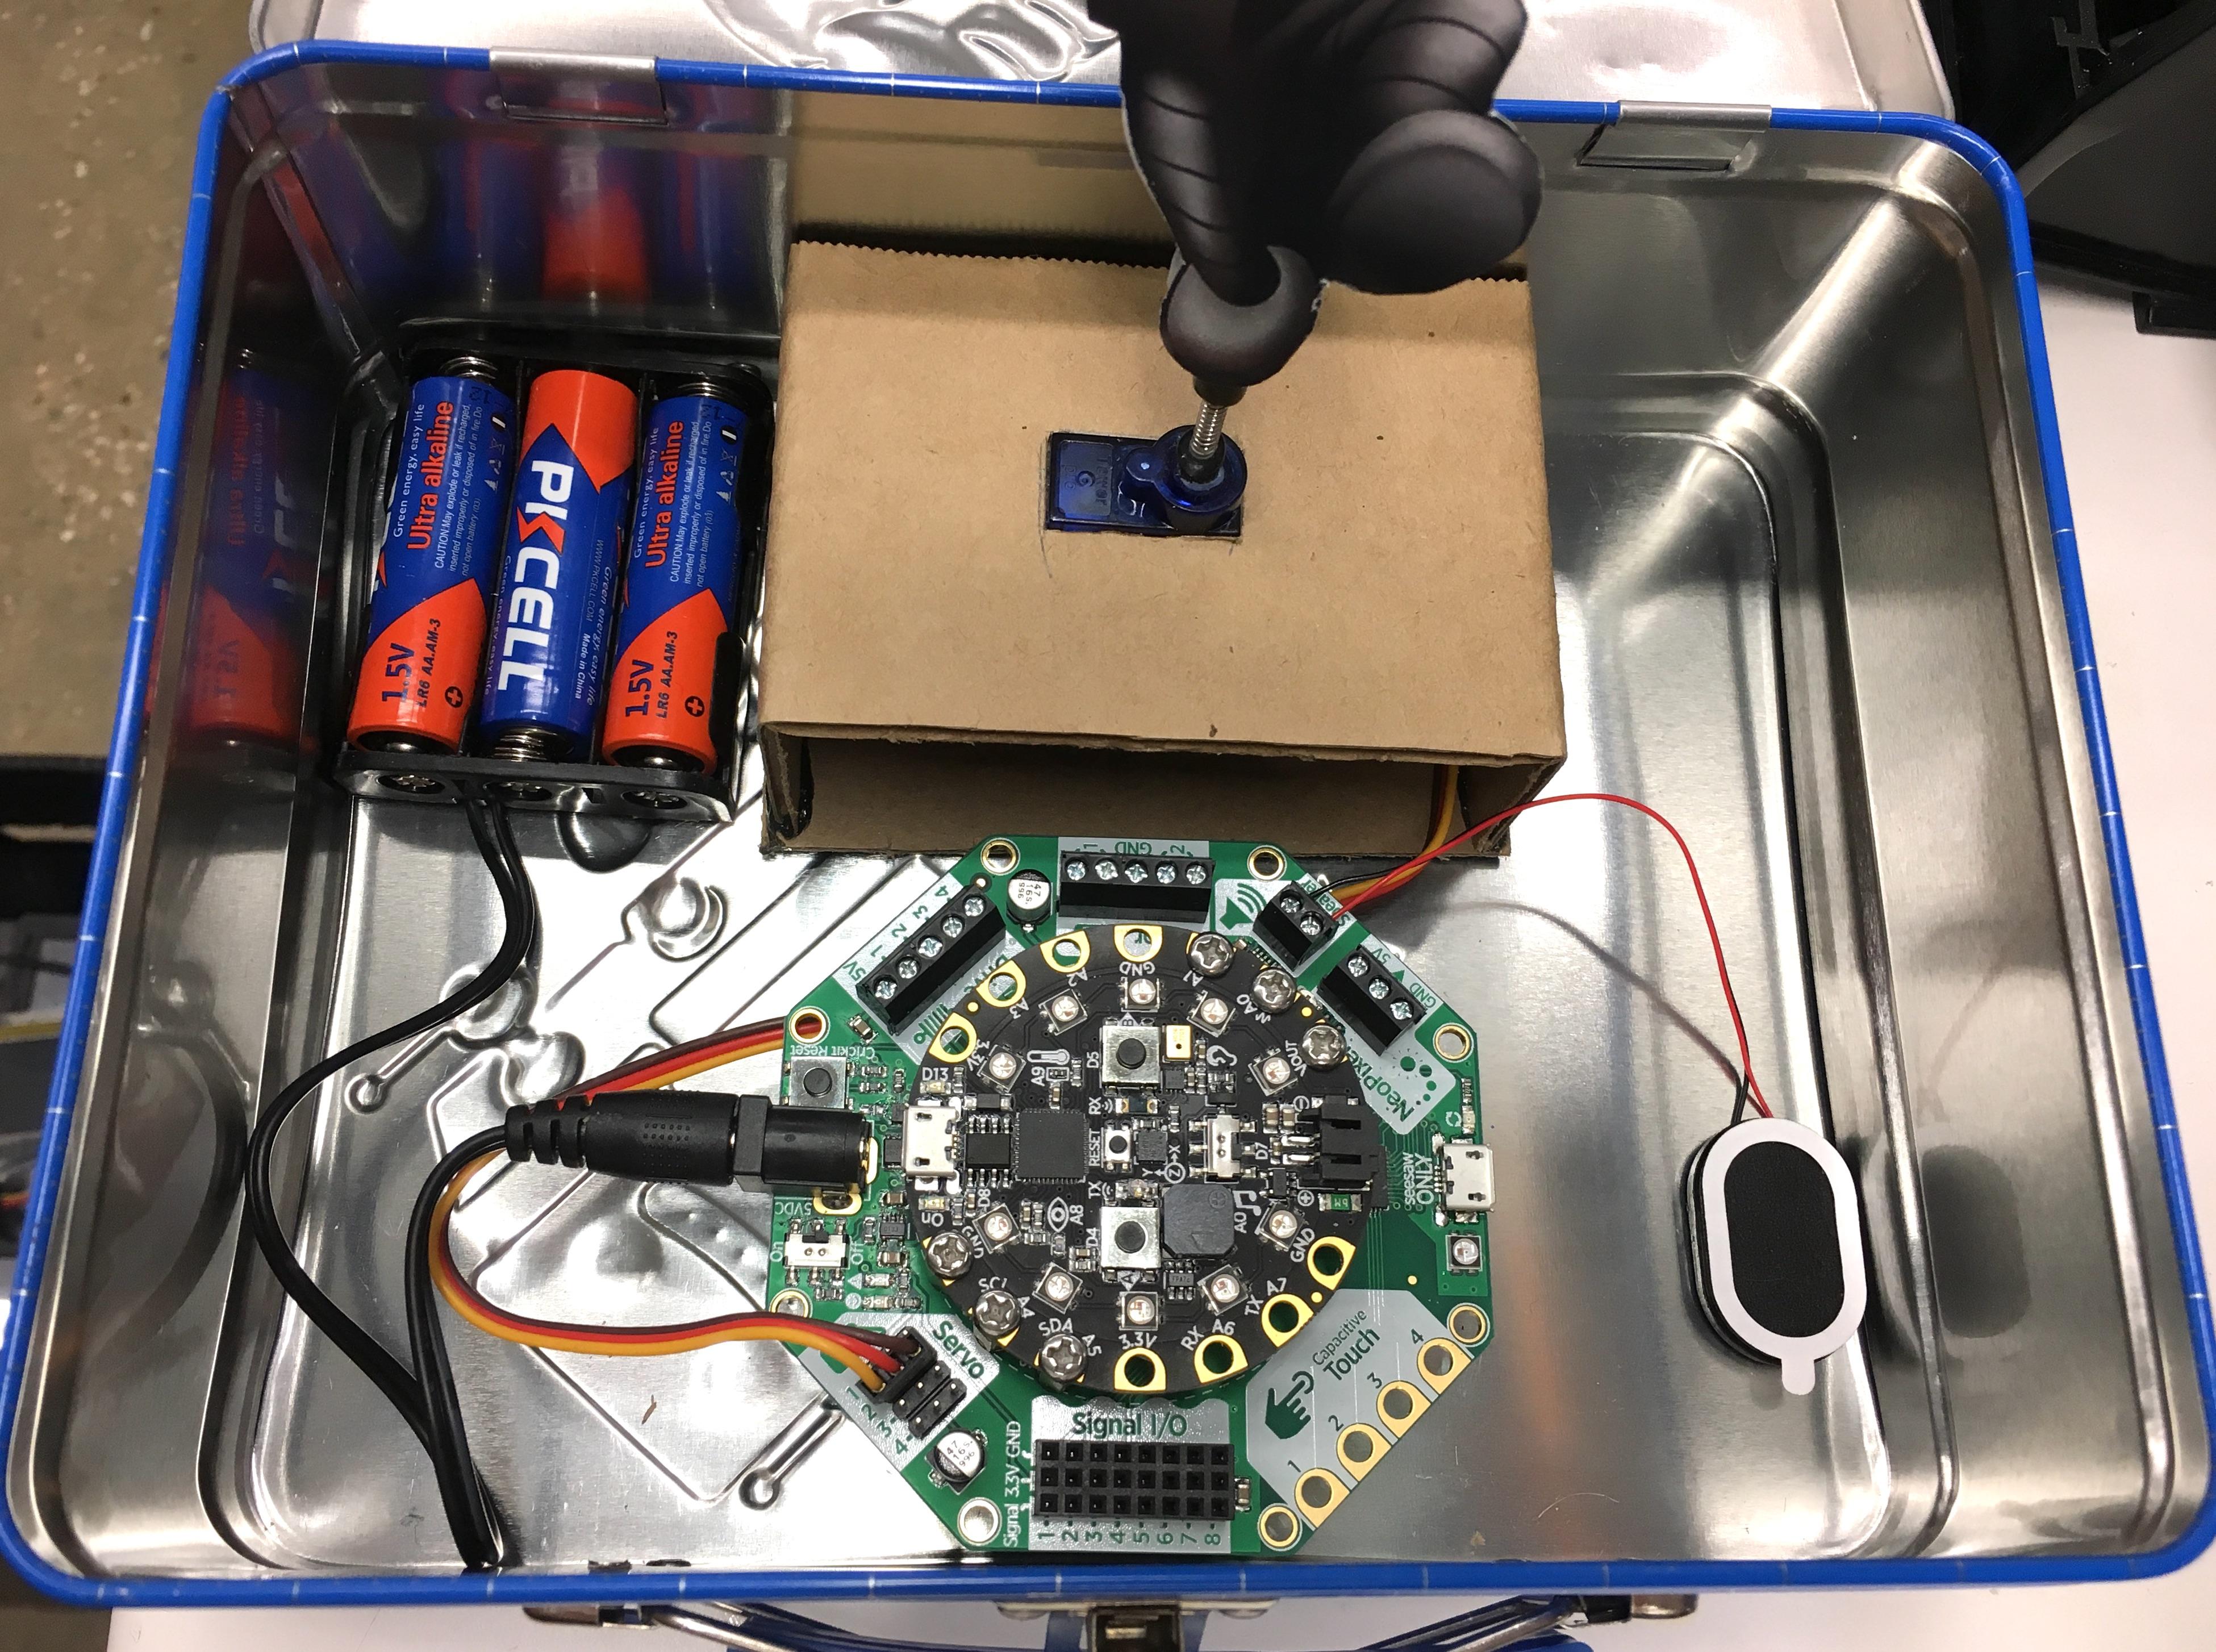 circuitpython_IMG_0980.jpg